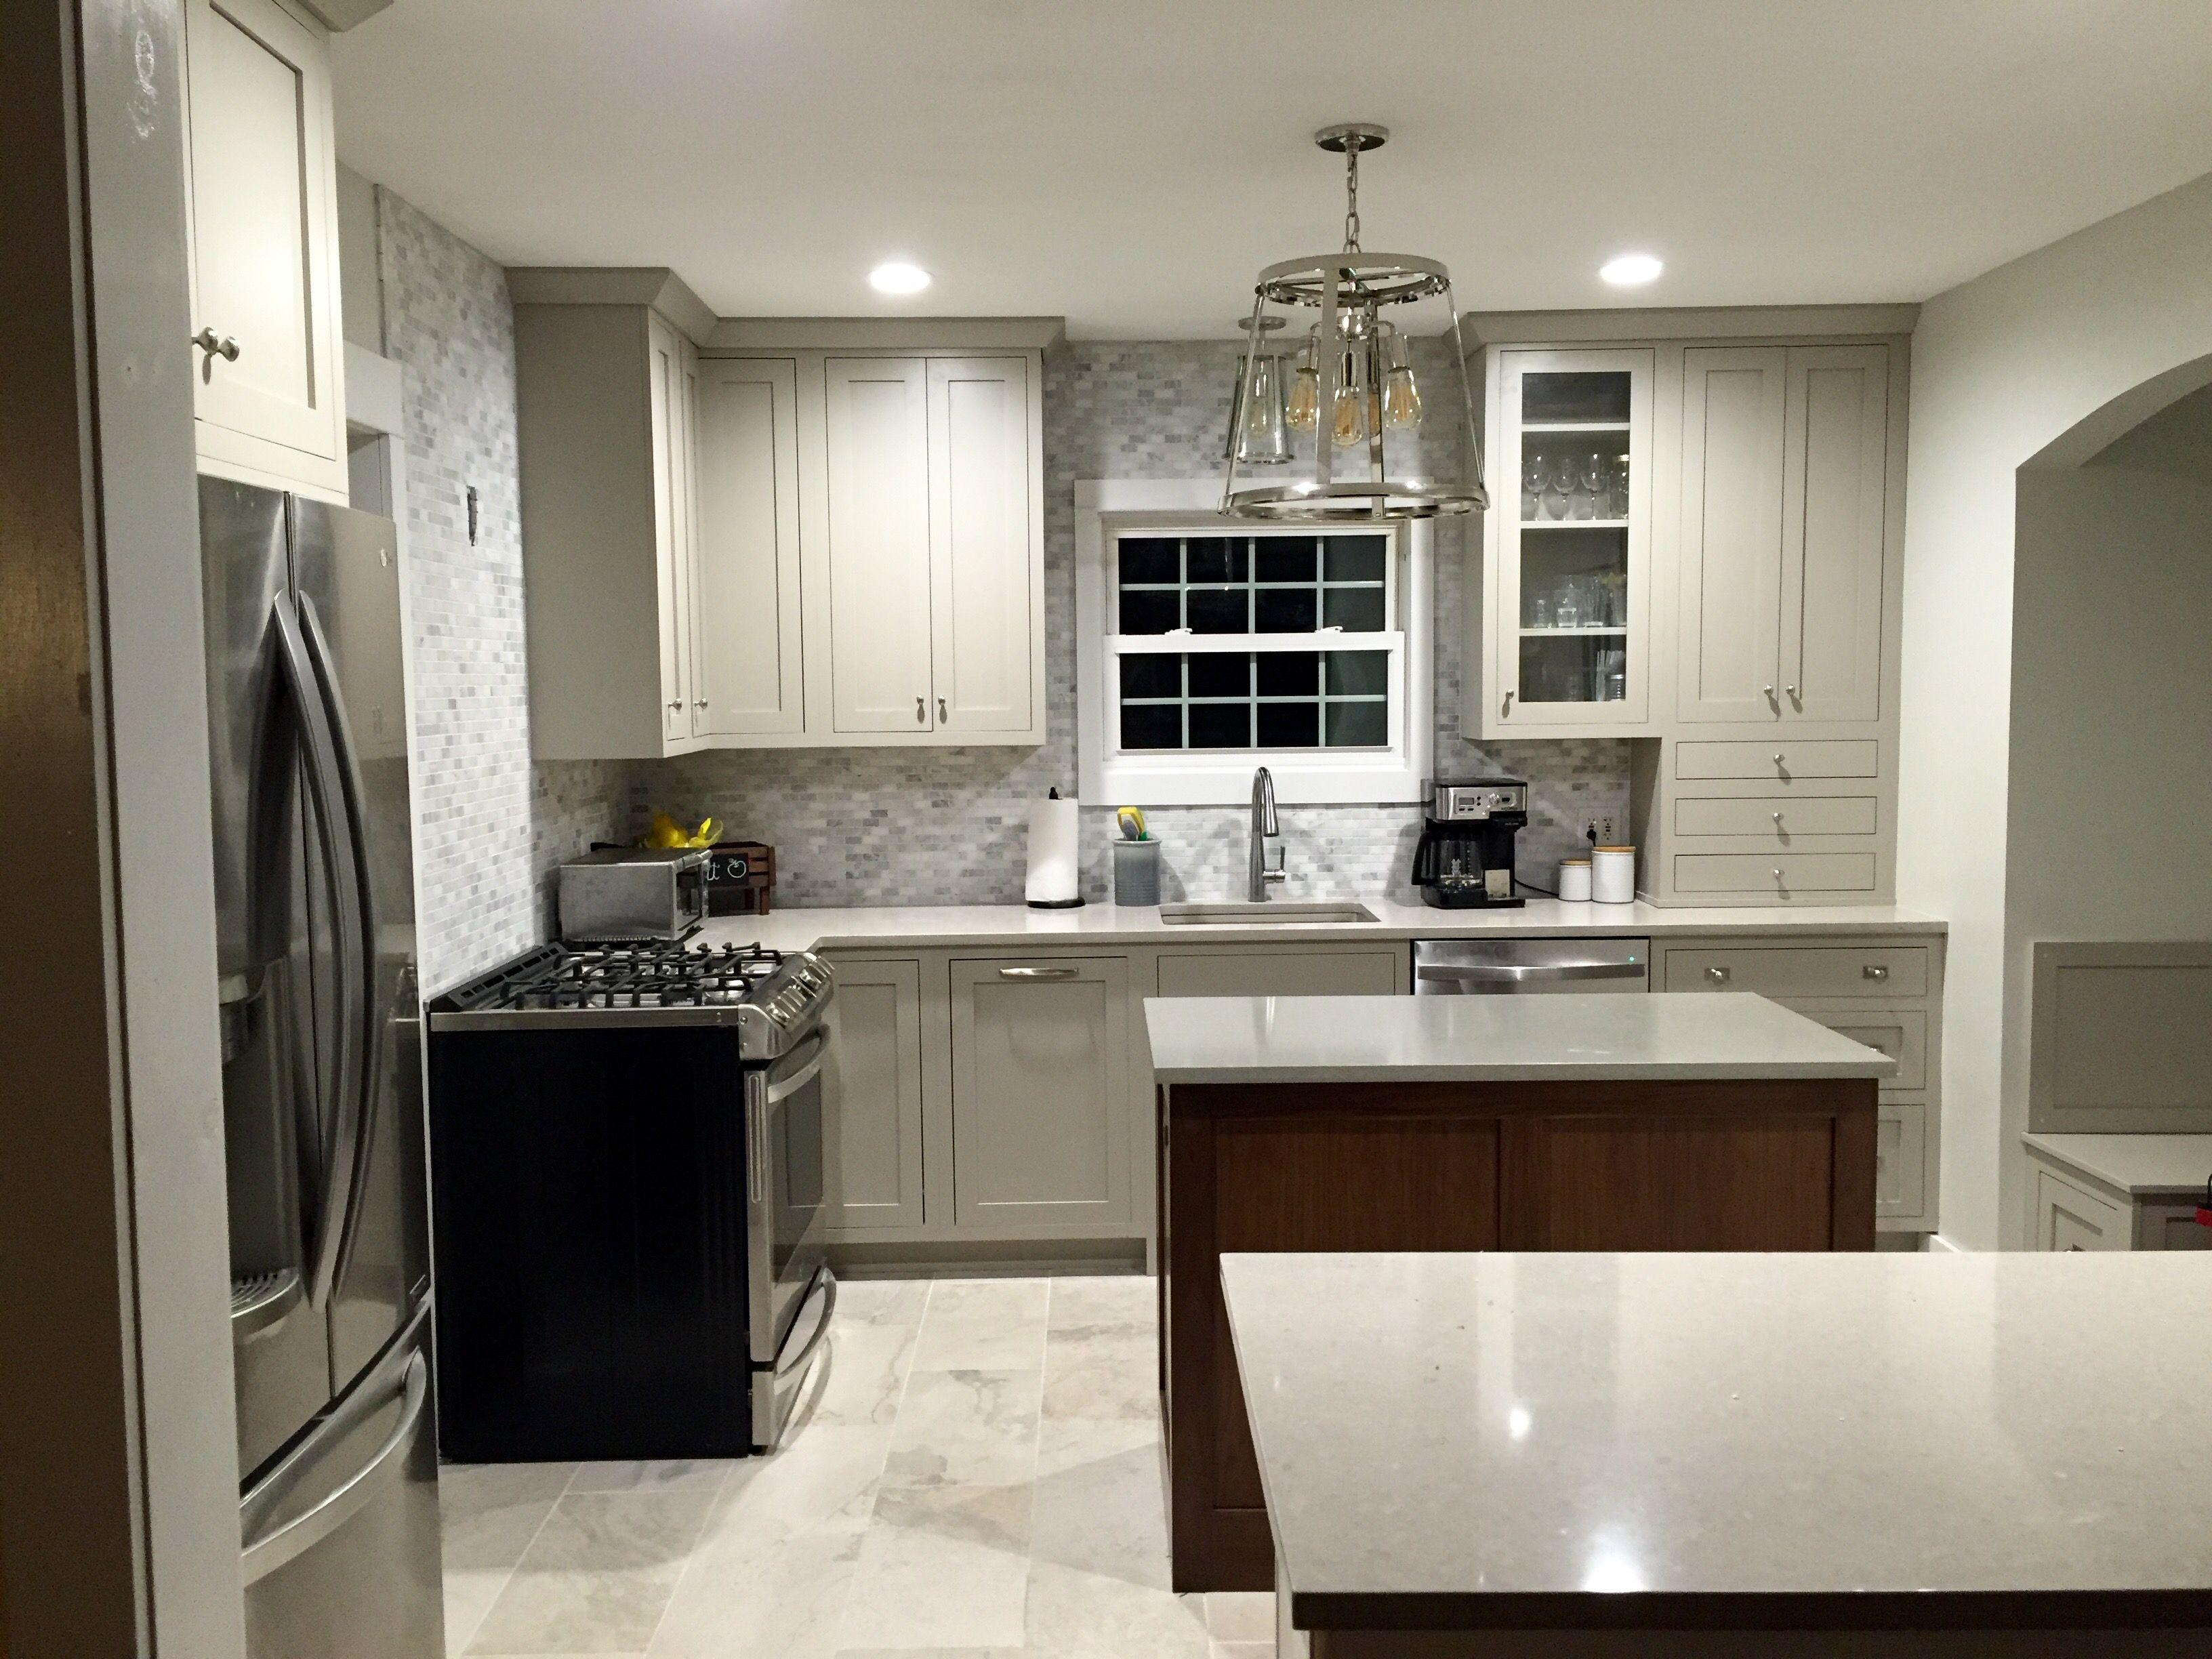 Fine Grey Shaker Cabinets Cottage Style Kitchen Conestoga Inset Interior Design Ideas Gentotryabchikinfo